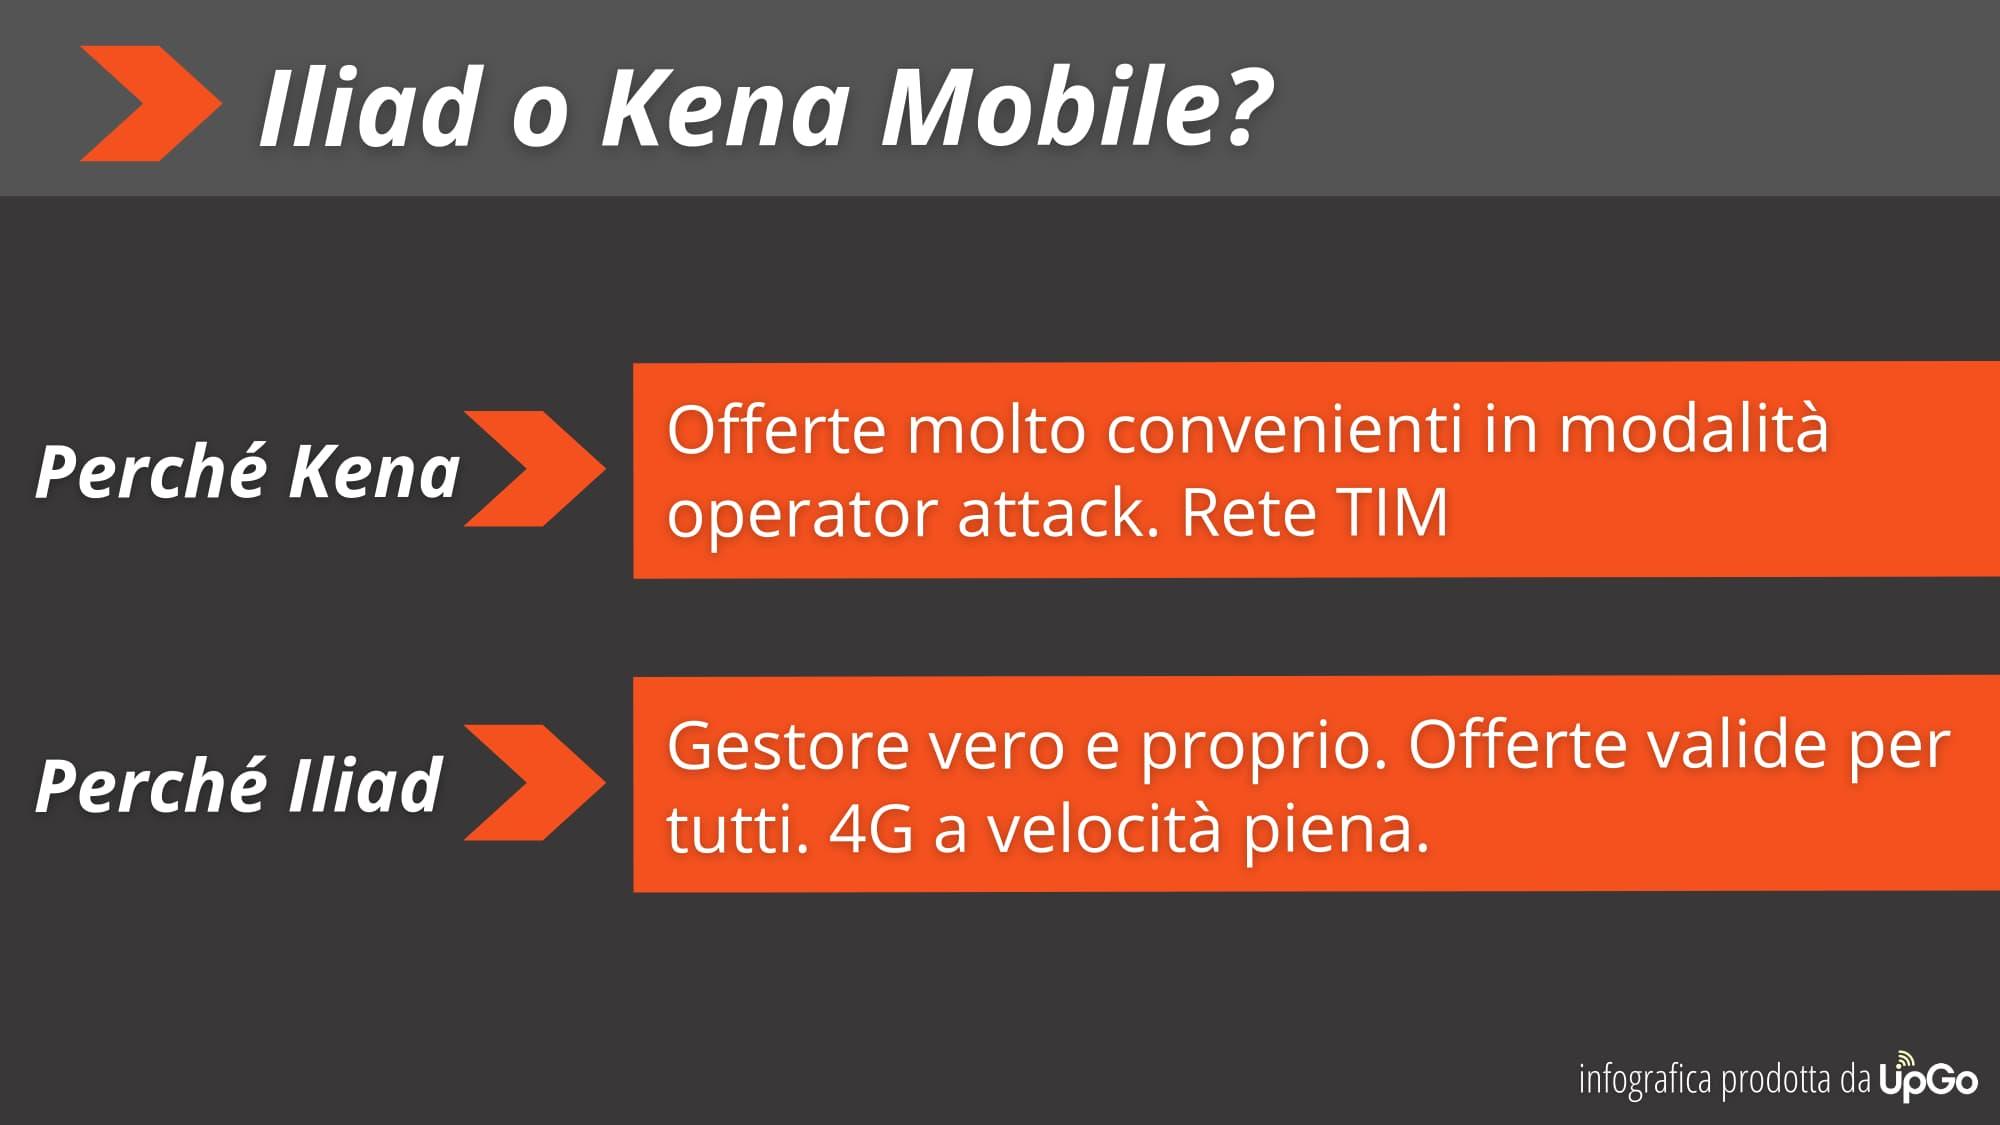 Iliad vs Kena Mobile Infographic